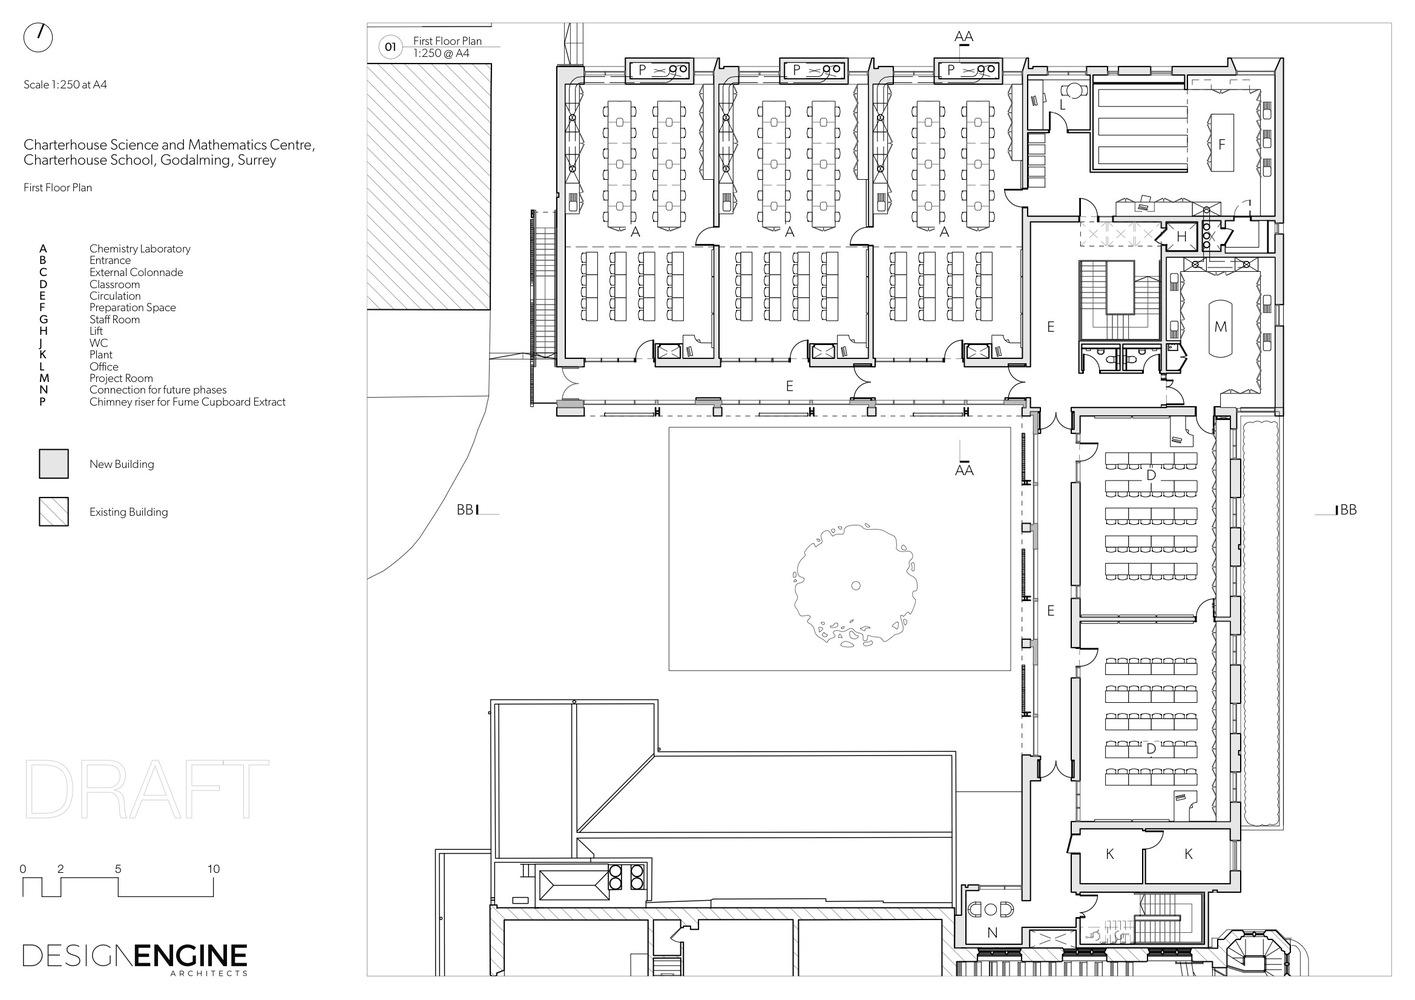 small resolution of charterhouse science mathematics centre design engine architects first floor plan